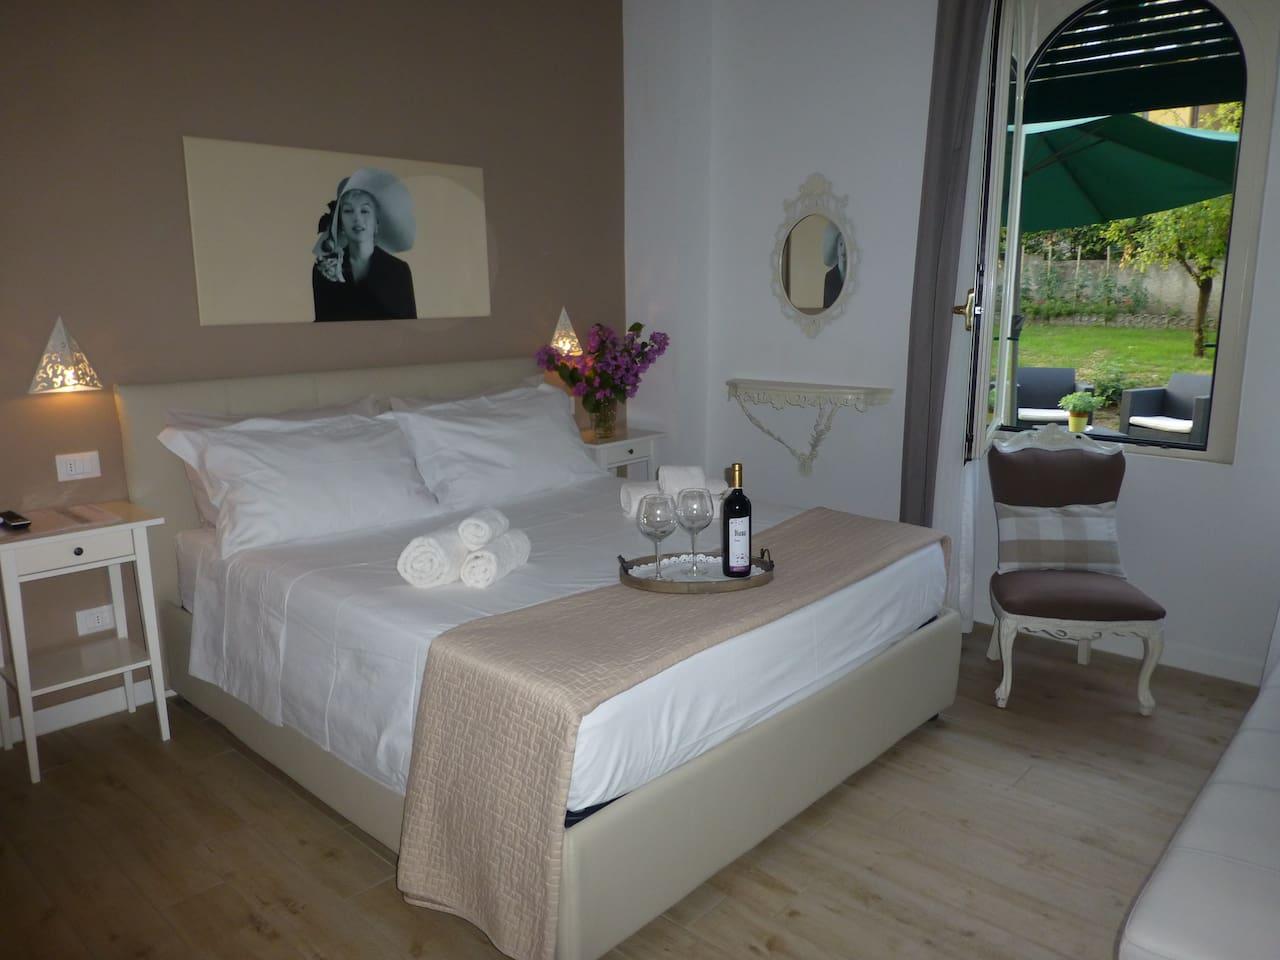 Marilyn Monroe room with bottle of wine - lovely details